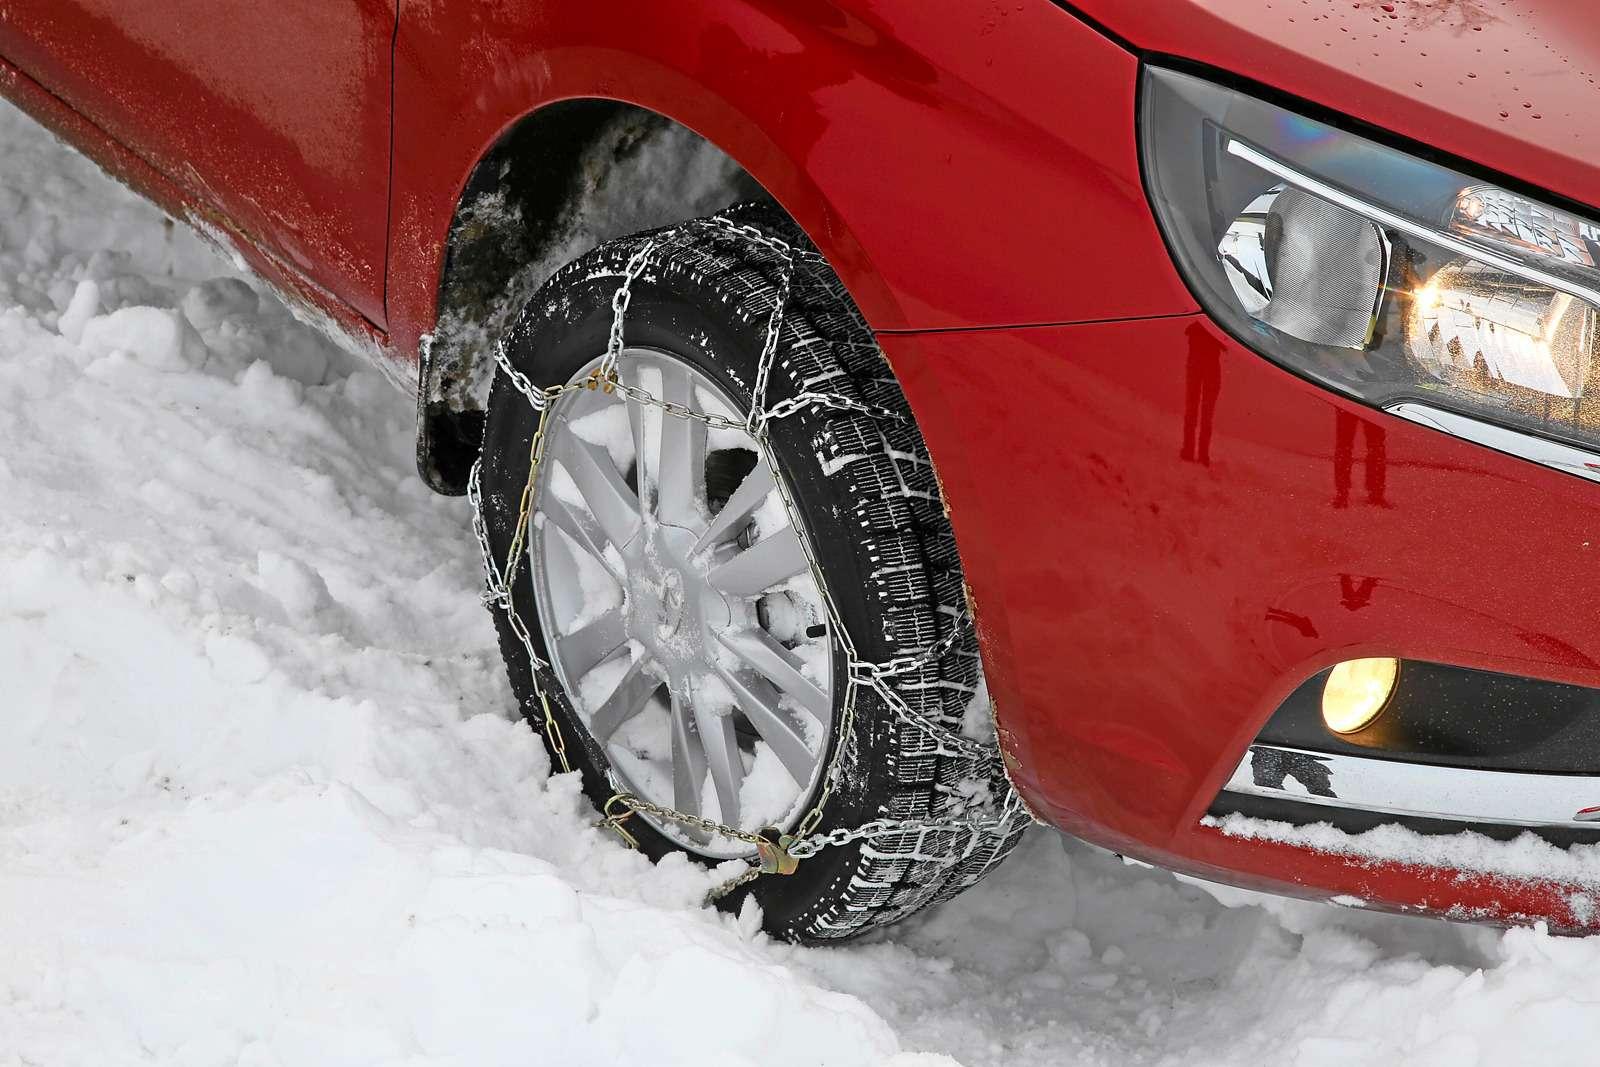 Большой зимний тест: Lada Vesta, Lada XRAY иDatsun mi-DO изпарка ЗР— фото 571445